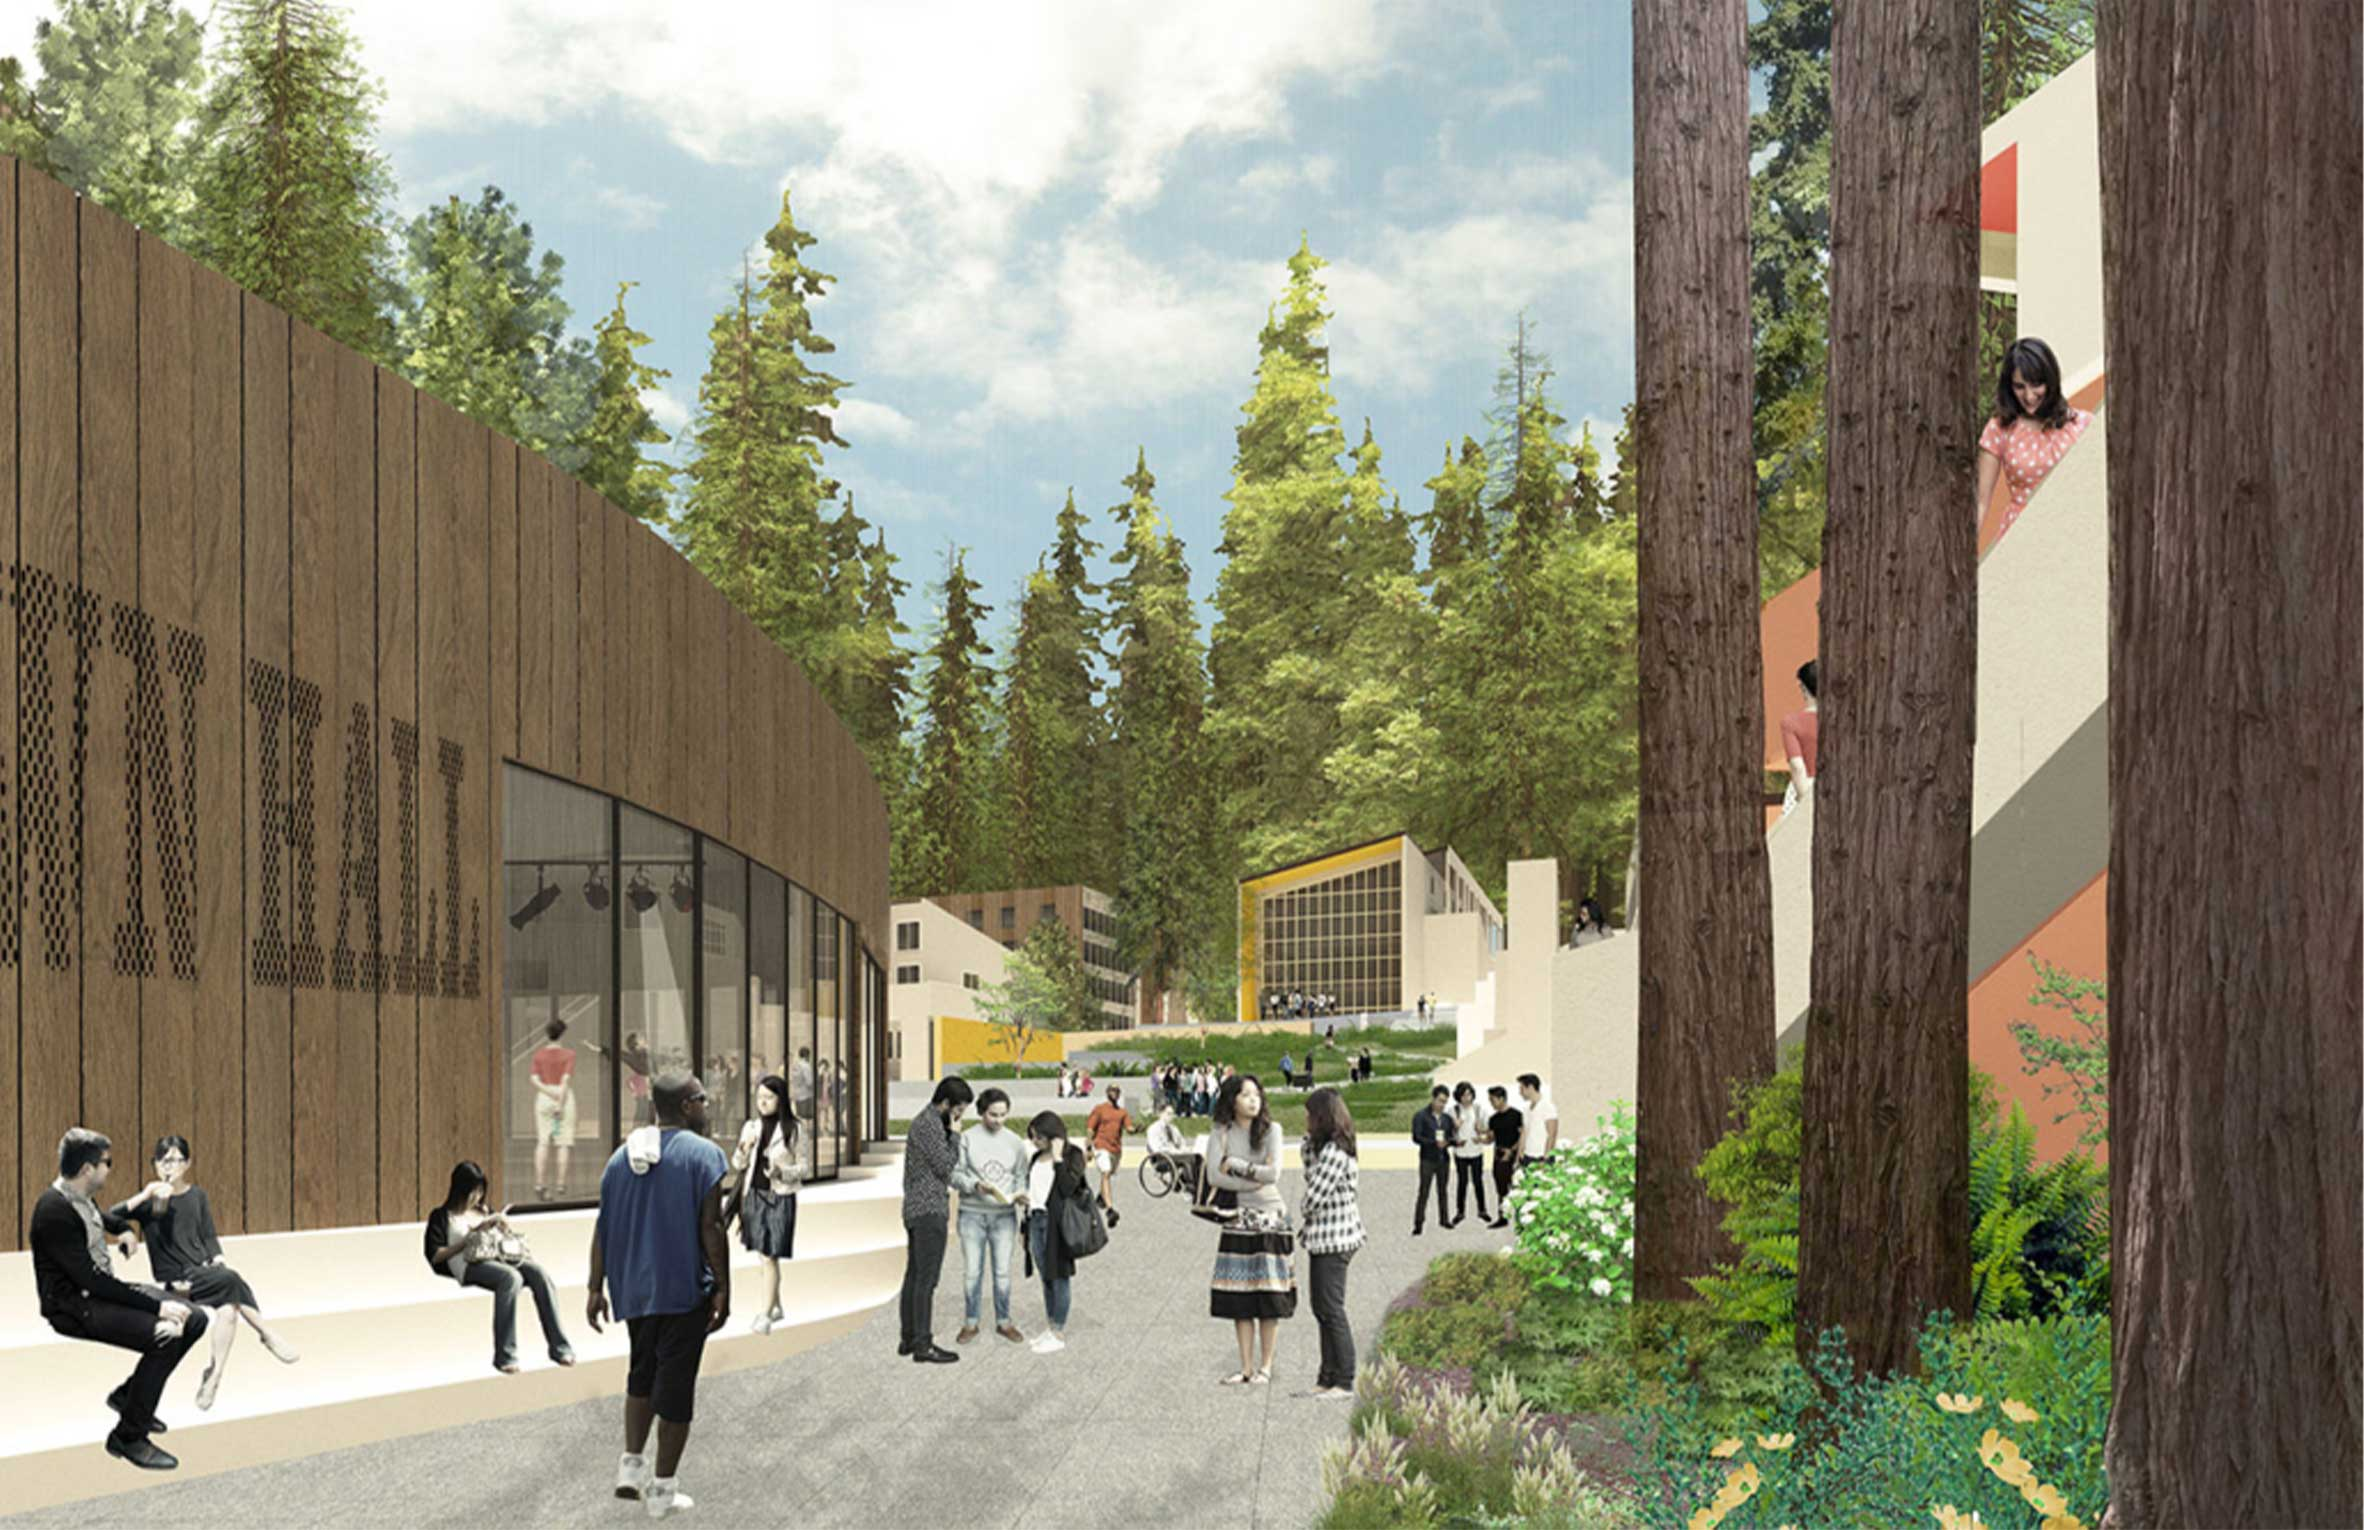 UC Santa Cruz Kresge College Renewal Breezeway with Redwoods Mass Timber and Students